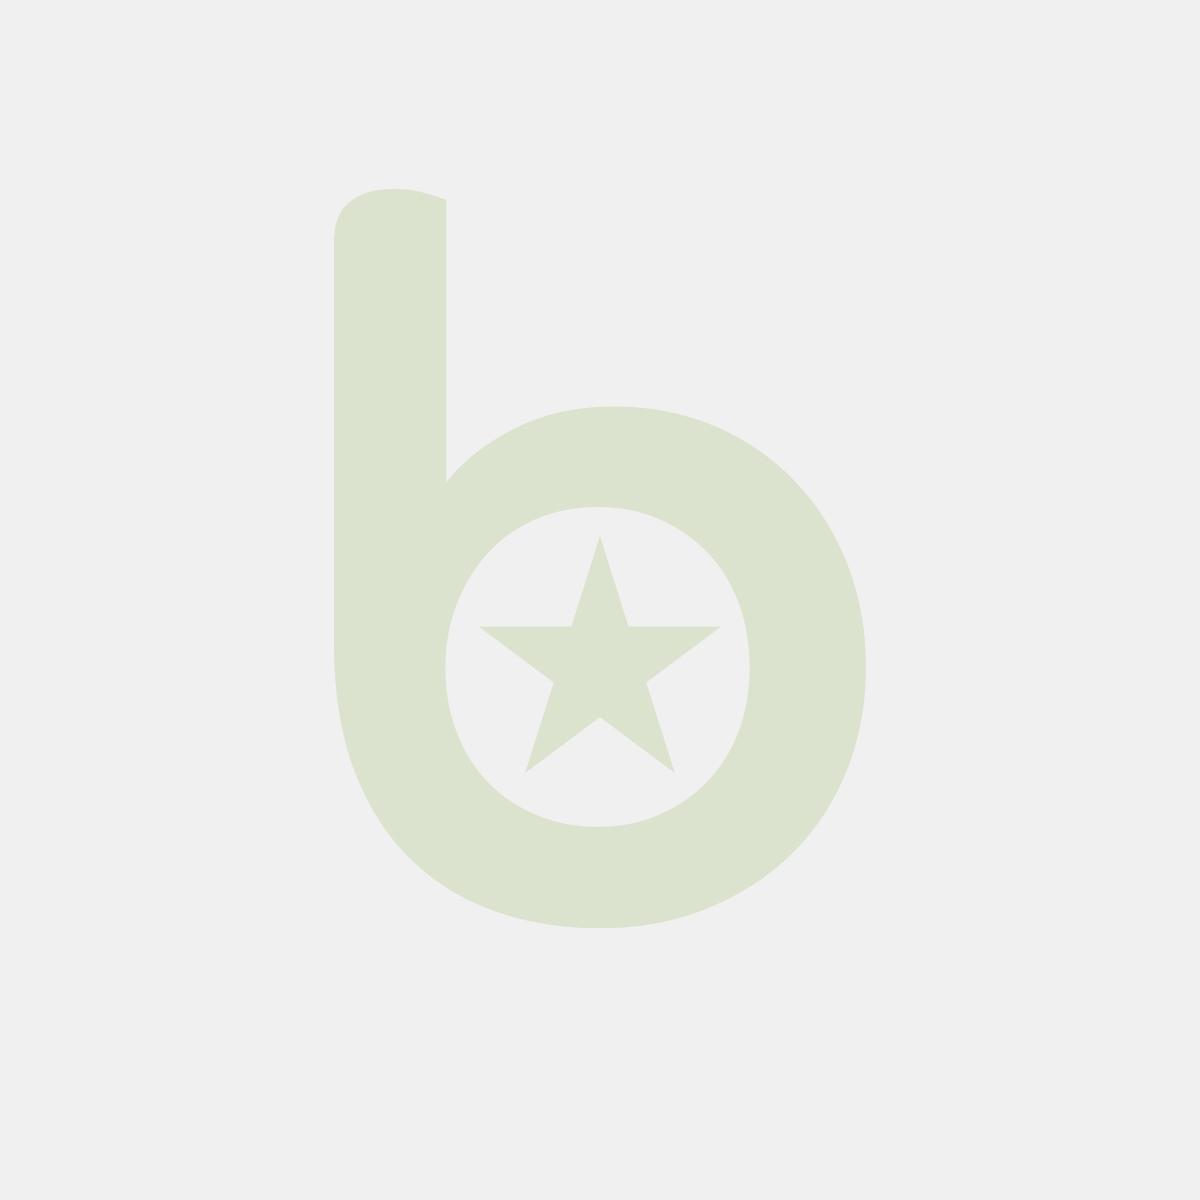 Pojemnik GN 1/3 Profi Line z polipropylenu